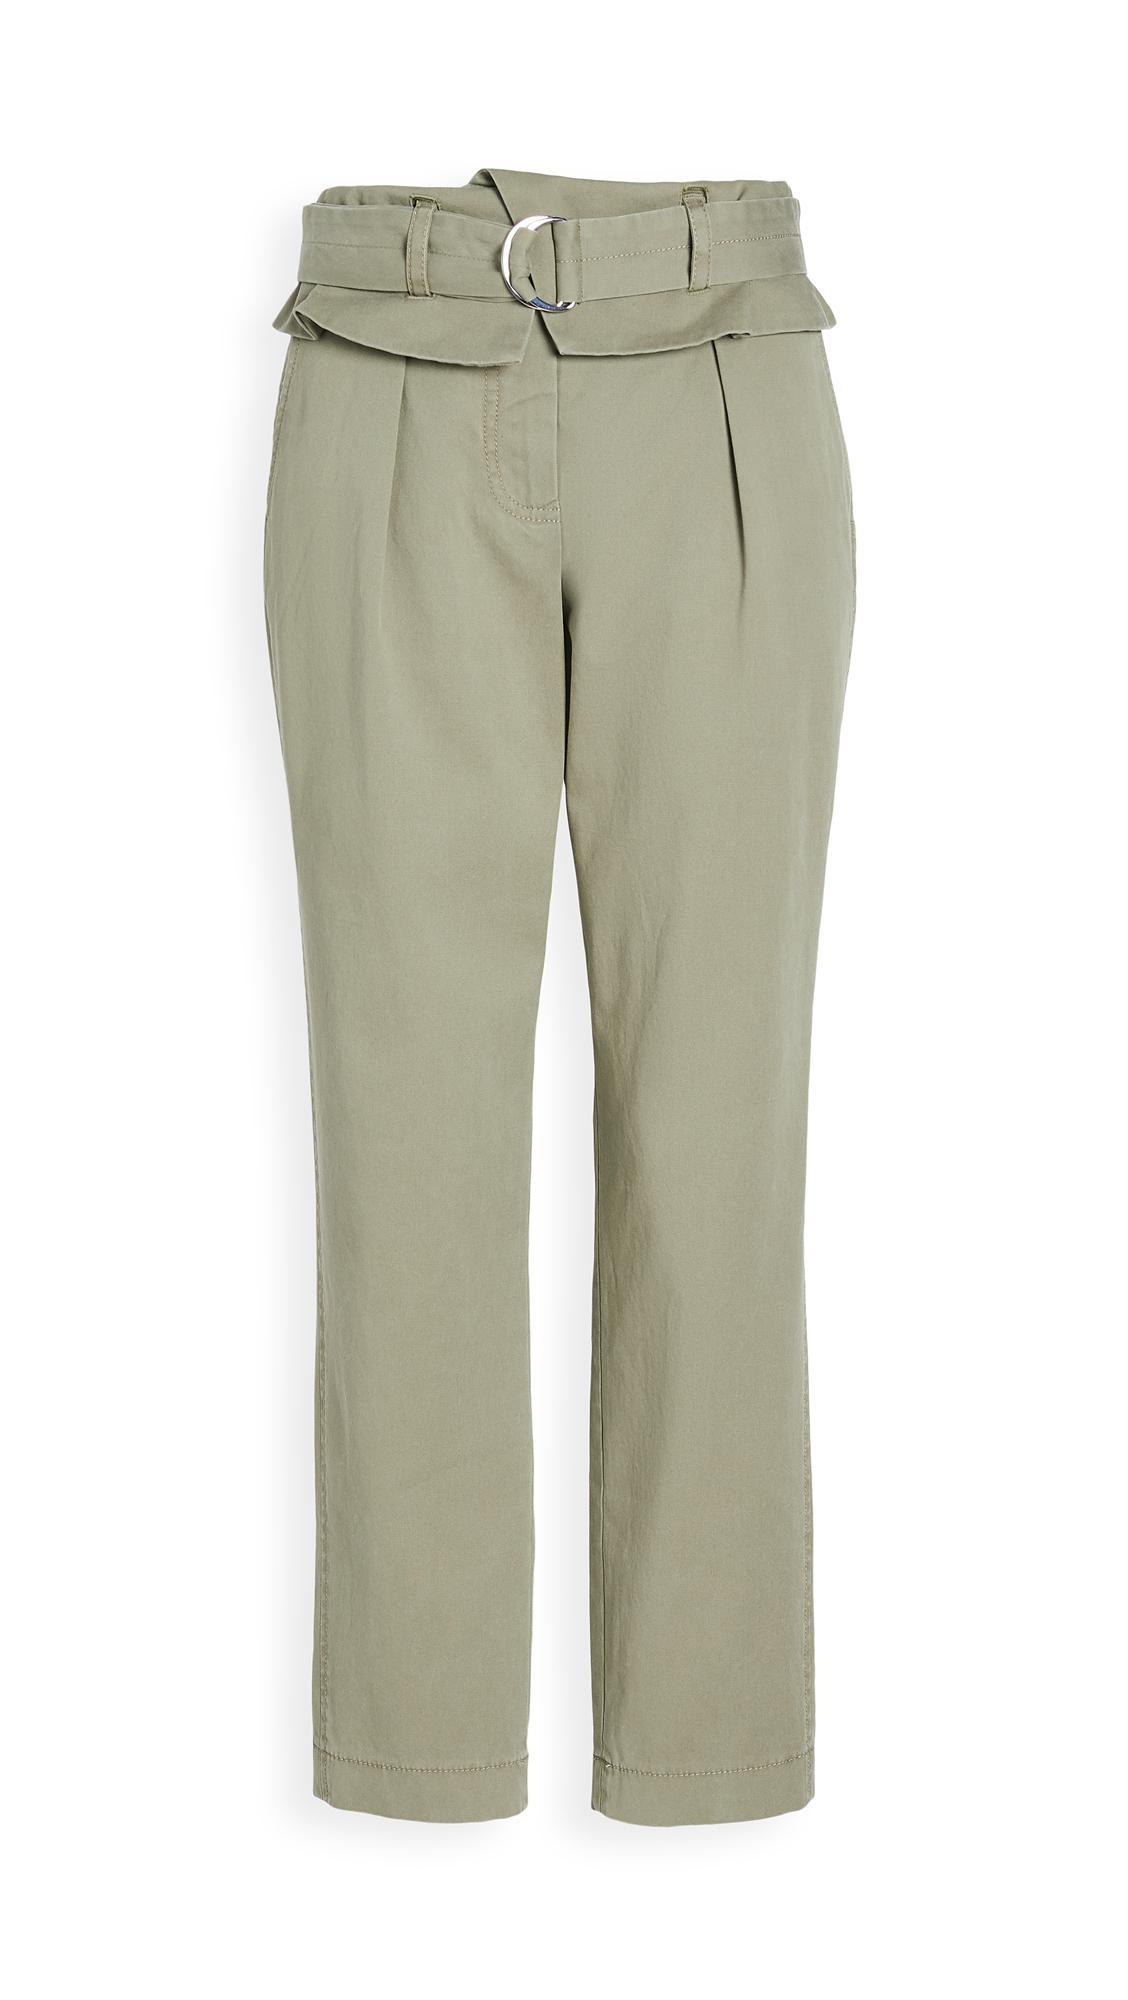 Derek Lam 10 Crosby Malia High Waisted Paper Bag Trousers